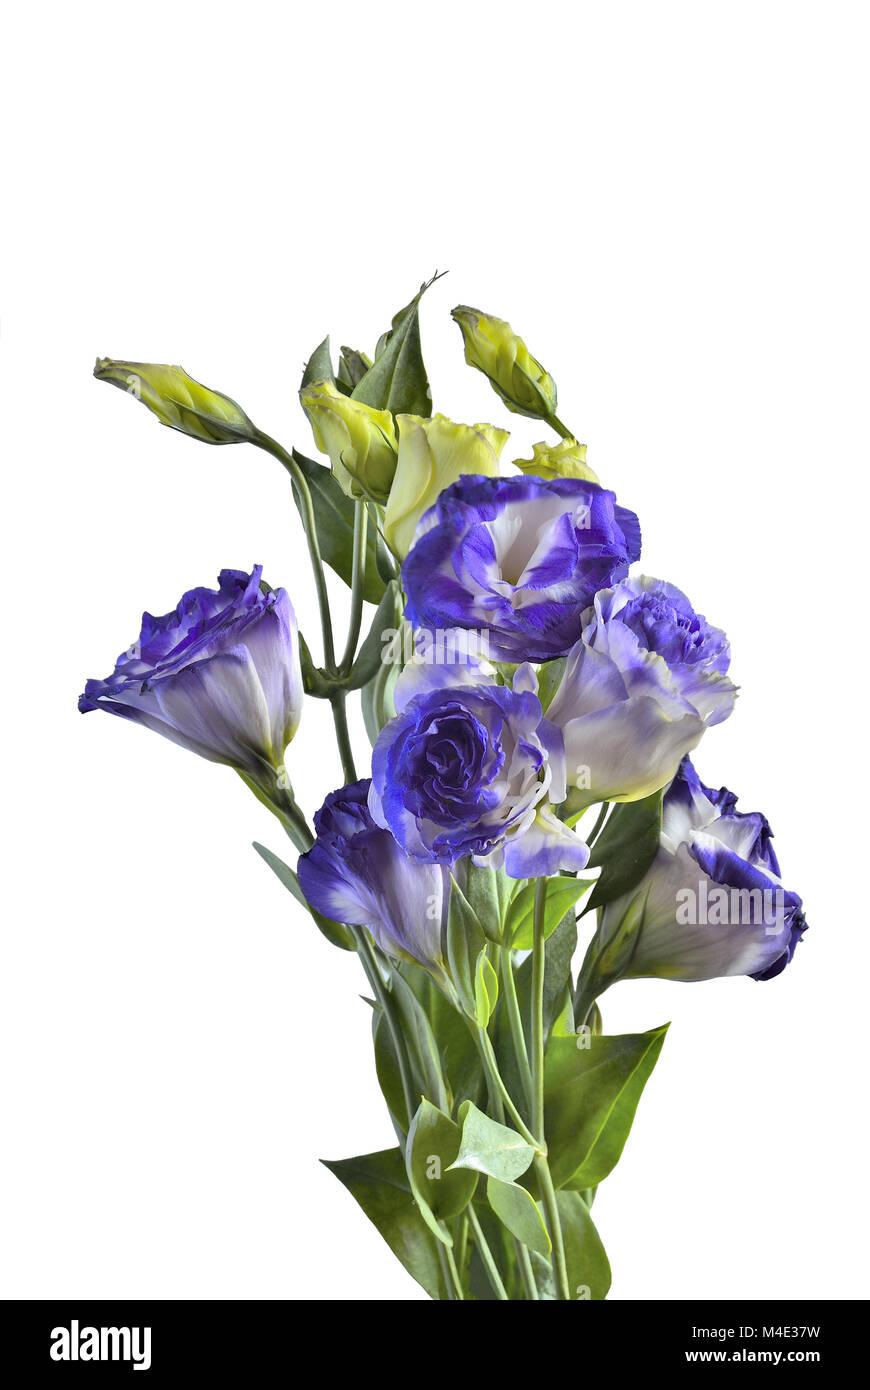 Bouquet of Eustoma flowers isolated on white Stock Photo